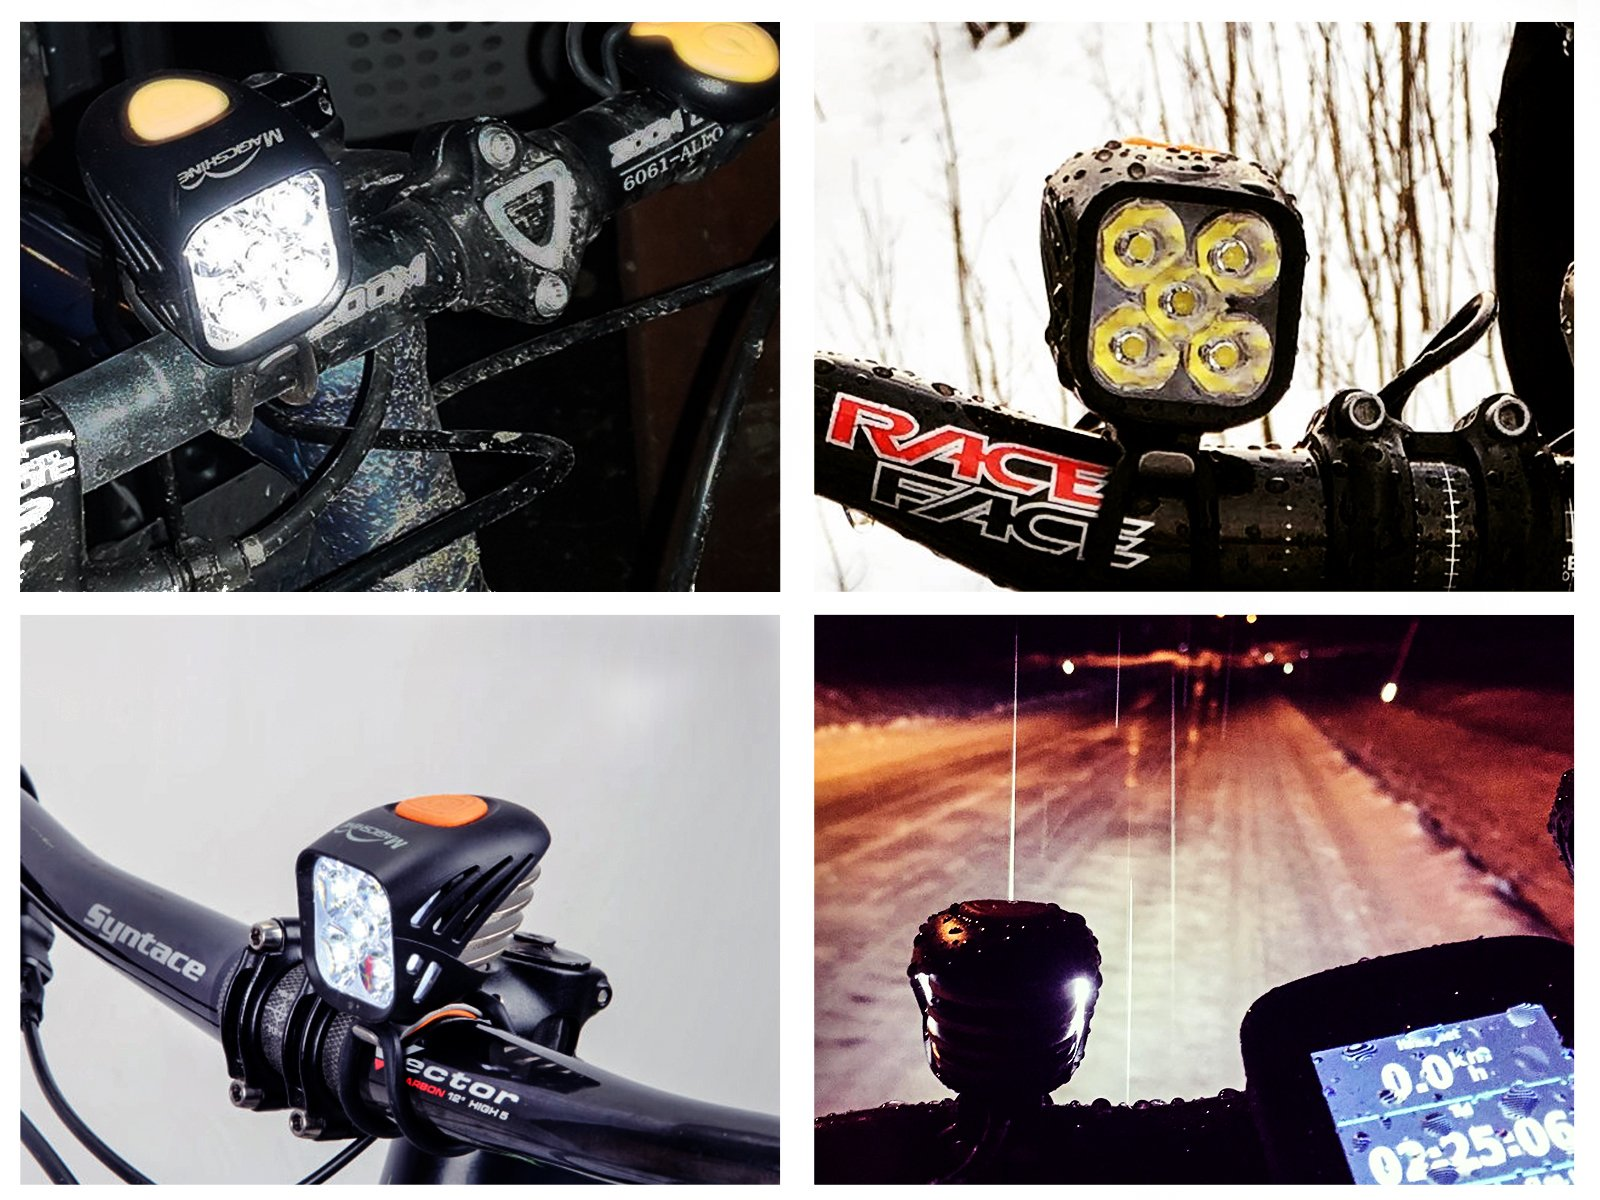 Magicshine MJ 906, High Grade MTB Enduro Bike Light Set, 5000 Lumens of Max output. Wireless Remote Bicycle Lights Front And Rear Combo, LED Bike Tail Light, Perfect Beam Pattern Bright Bike Light by Magicshine (Image #4)